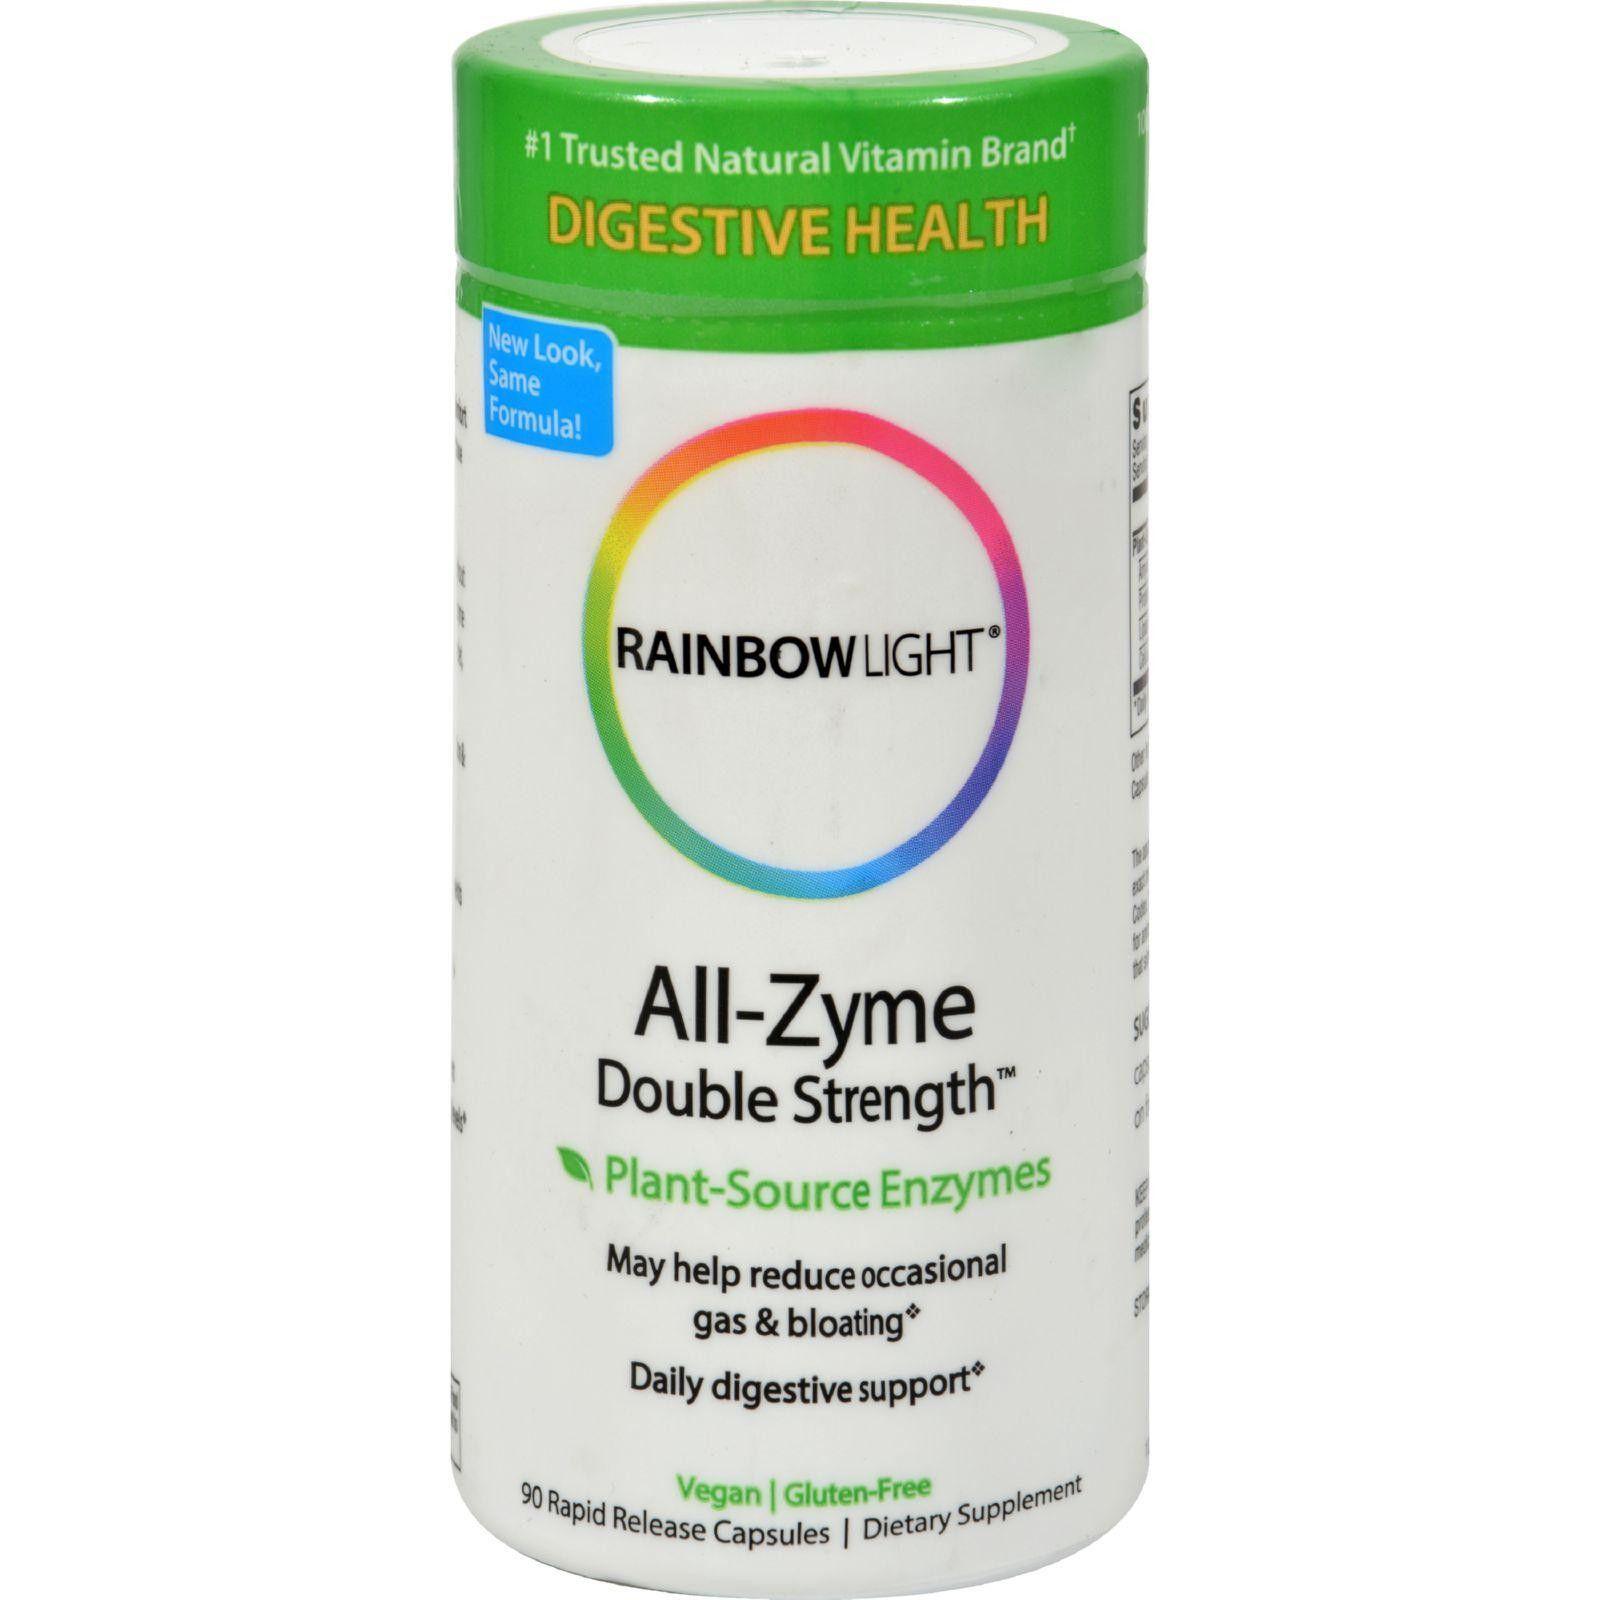 Rainbow light allzyme double strength free vegetarian